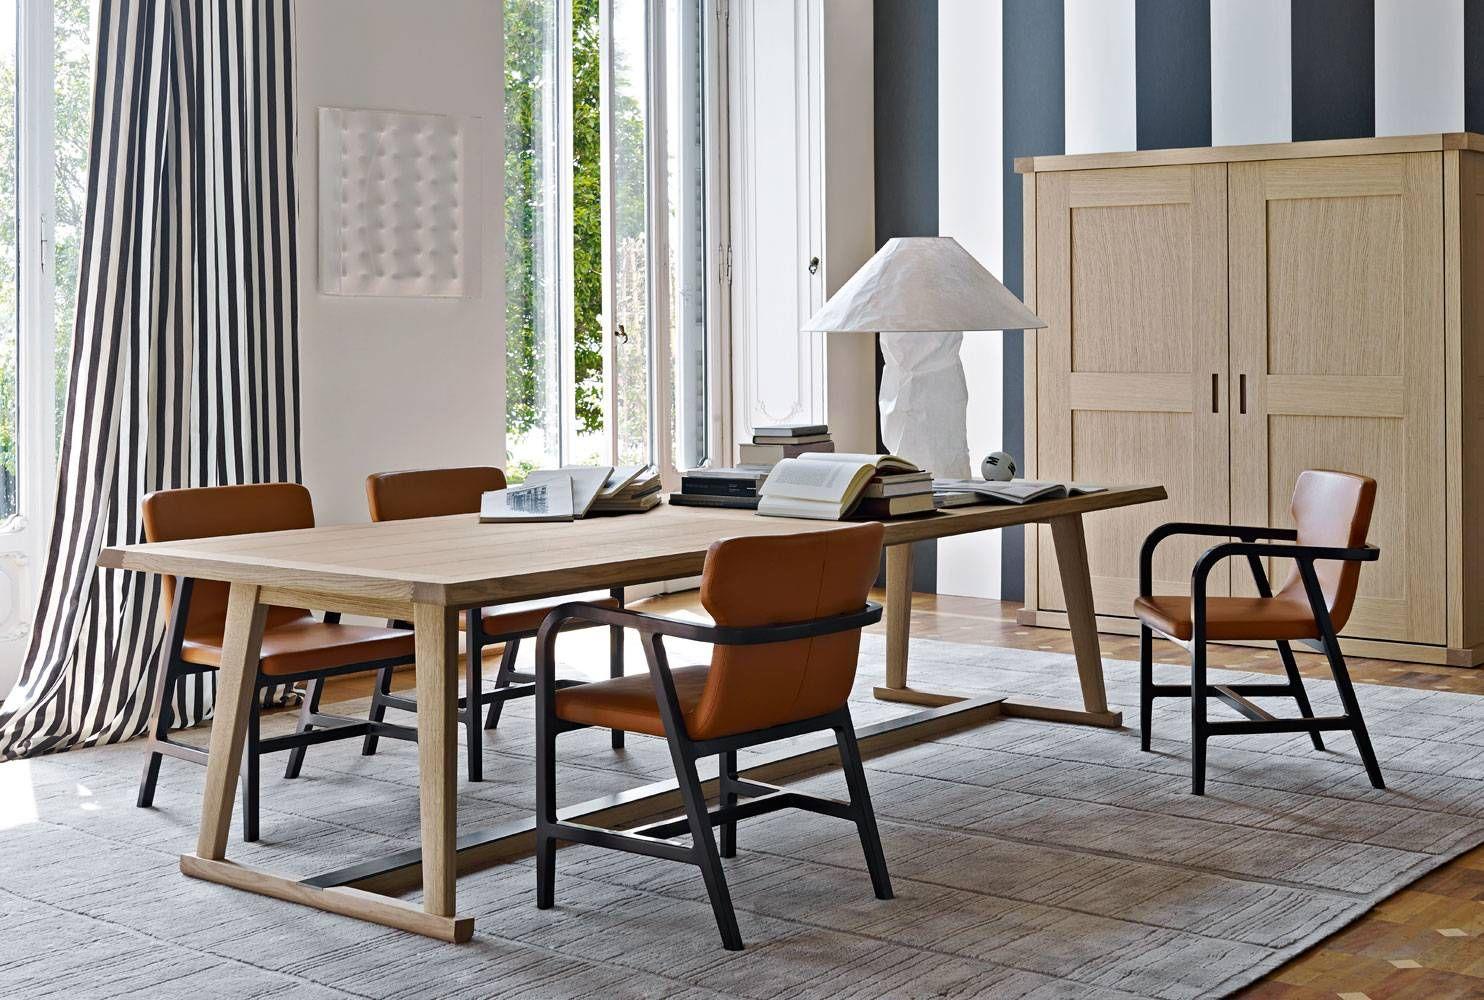 Table Recipio 14 Maxalto Design By Antonio Citterio